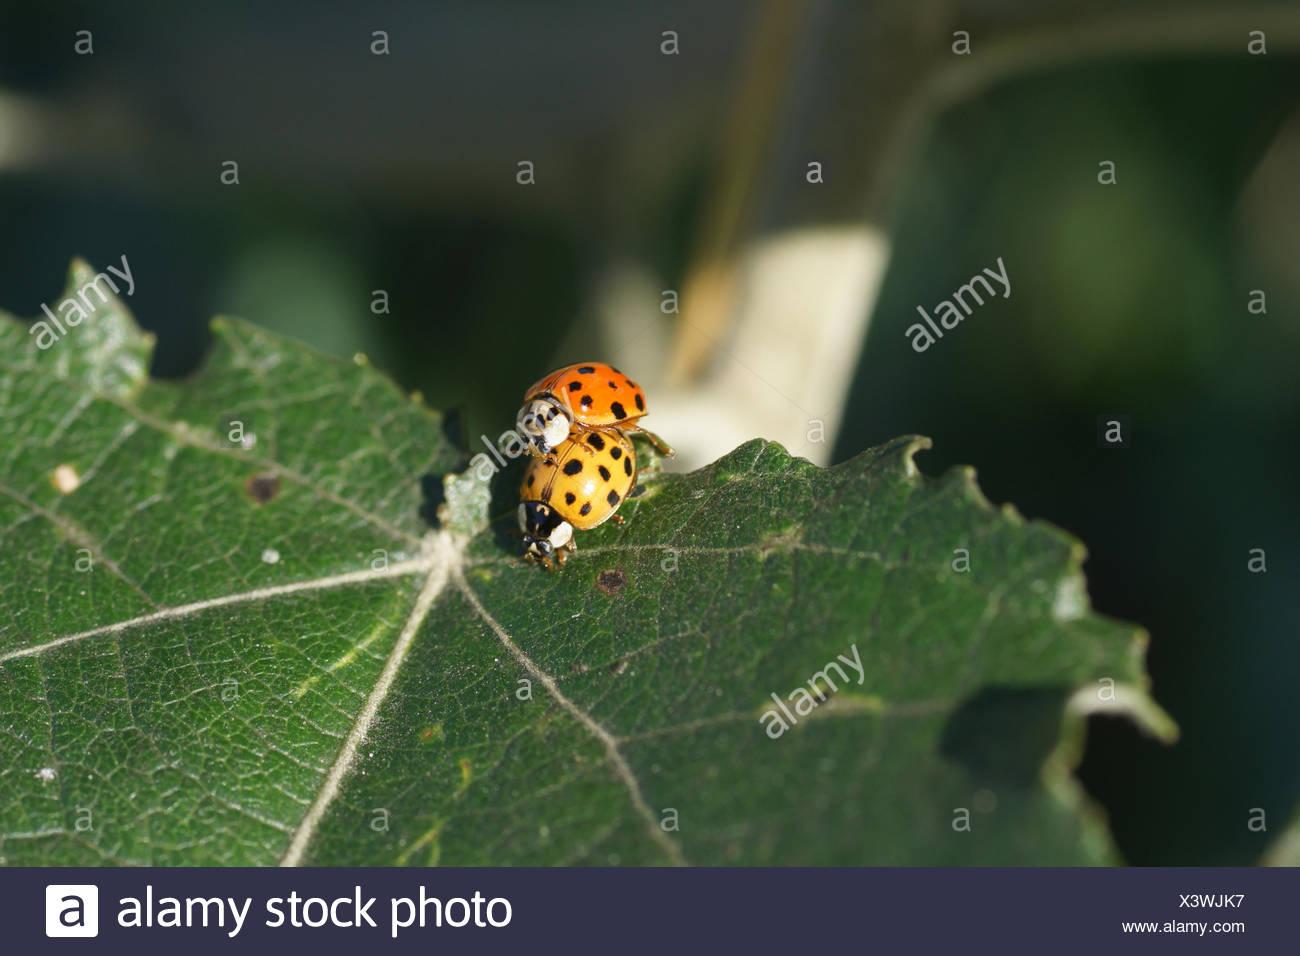 Mating harlequin lady beetles - Stock Image